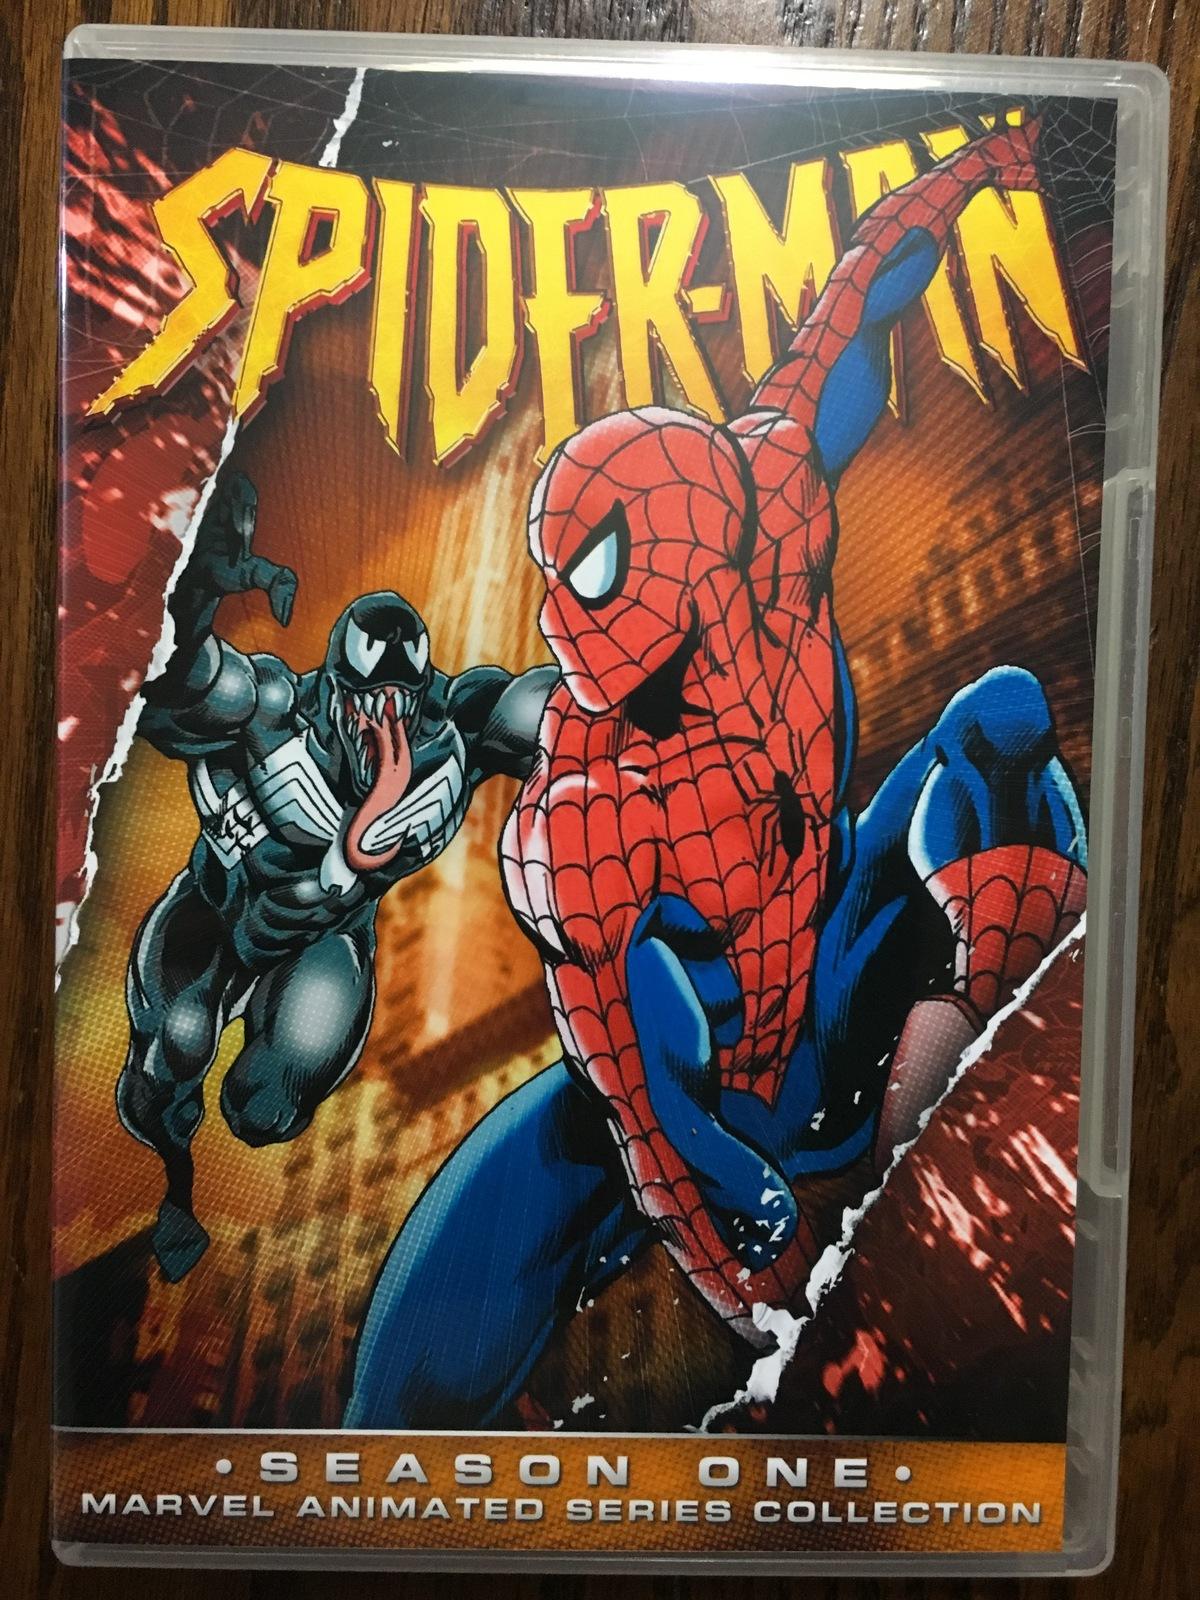 SpiderMan 1994 Series Season 1 DVD